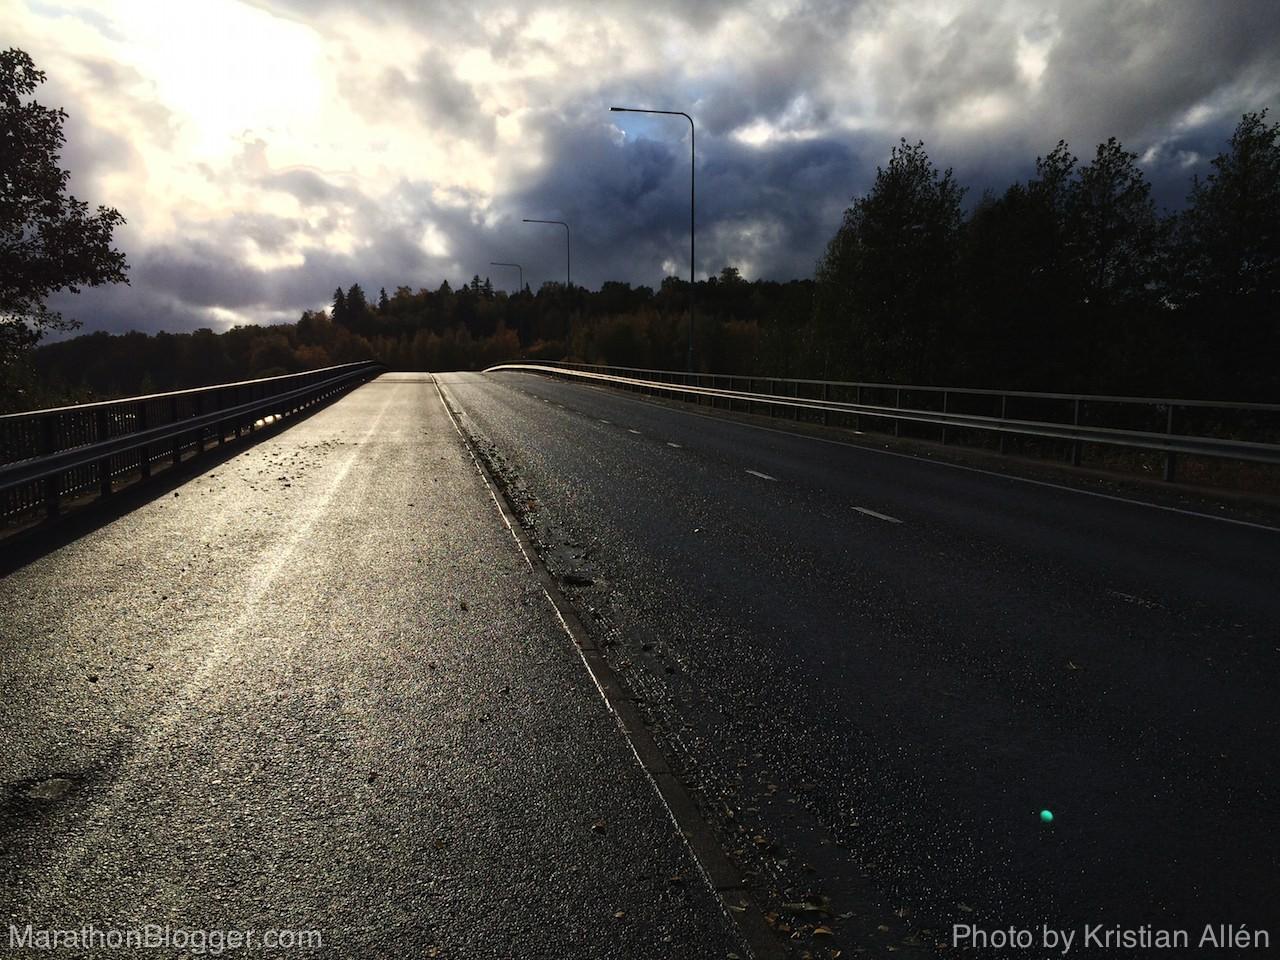 8.10.2014 21.12 km